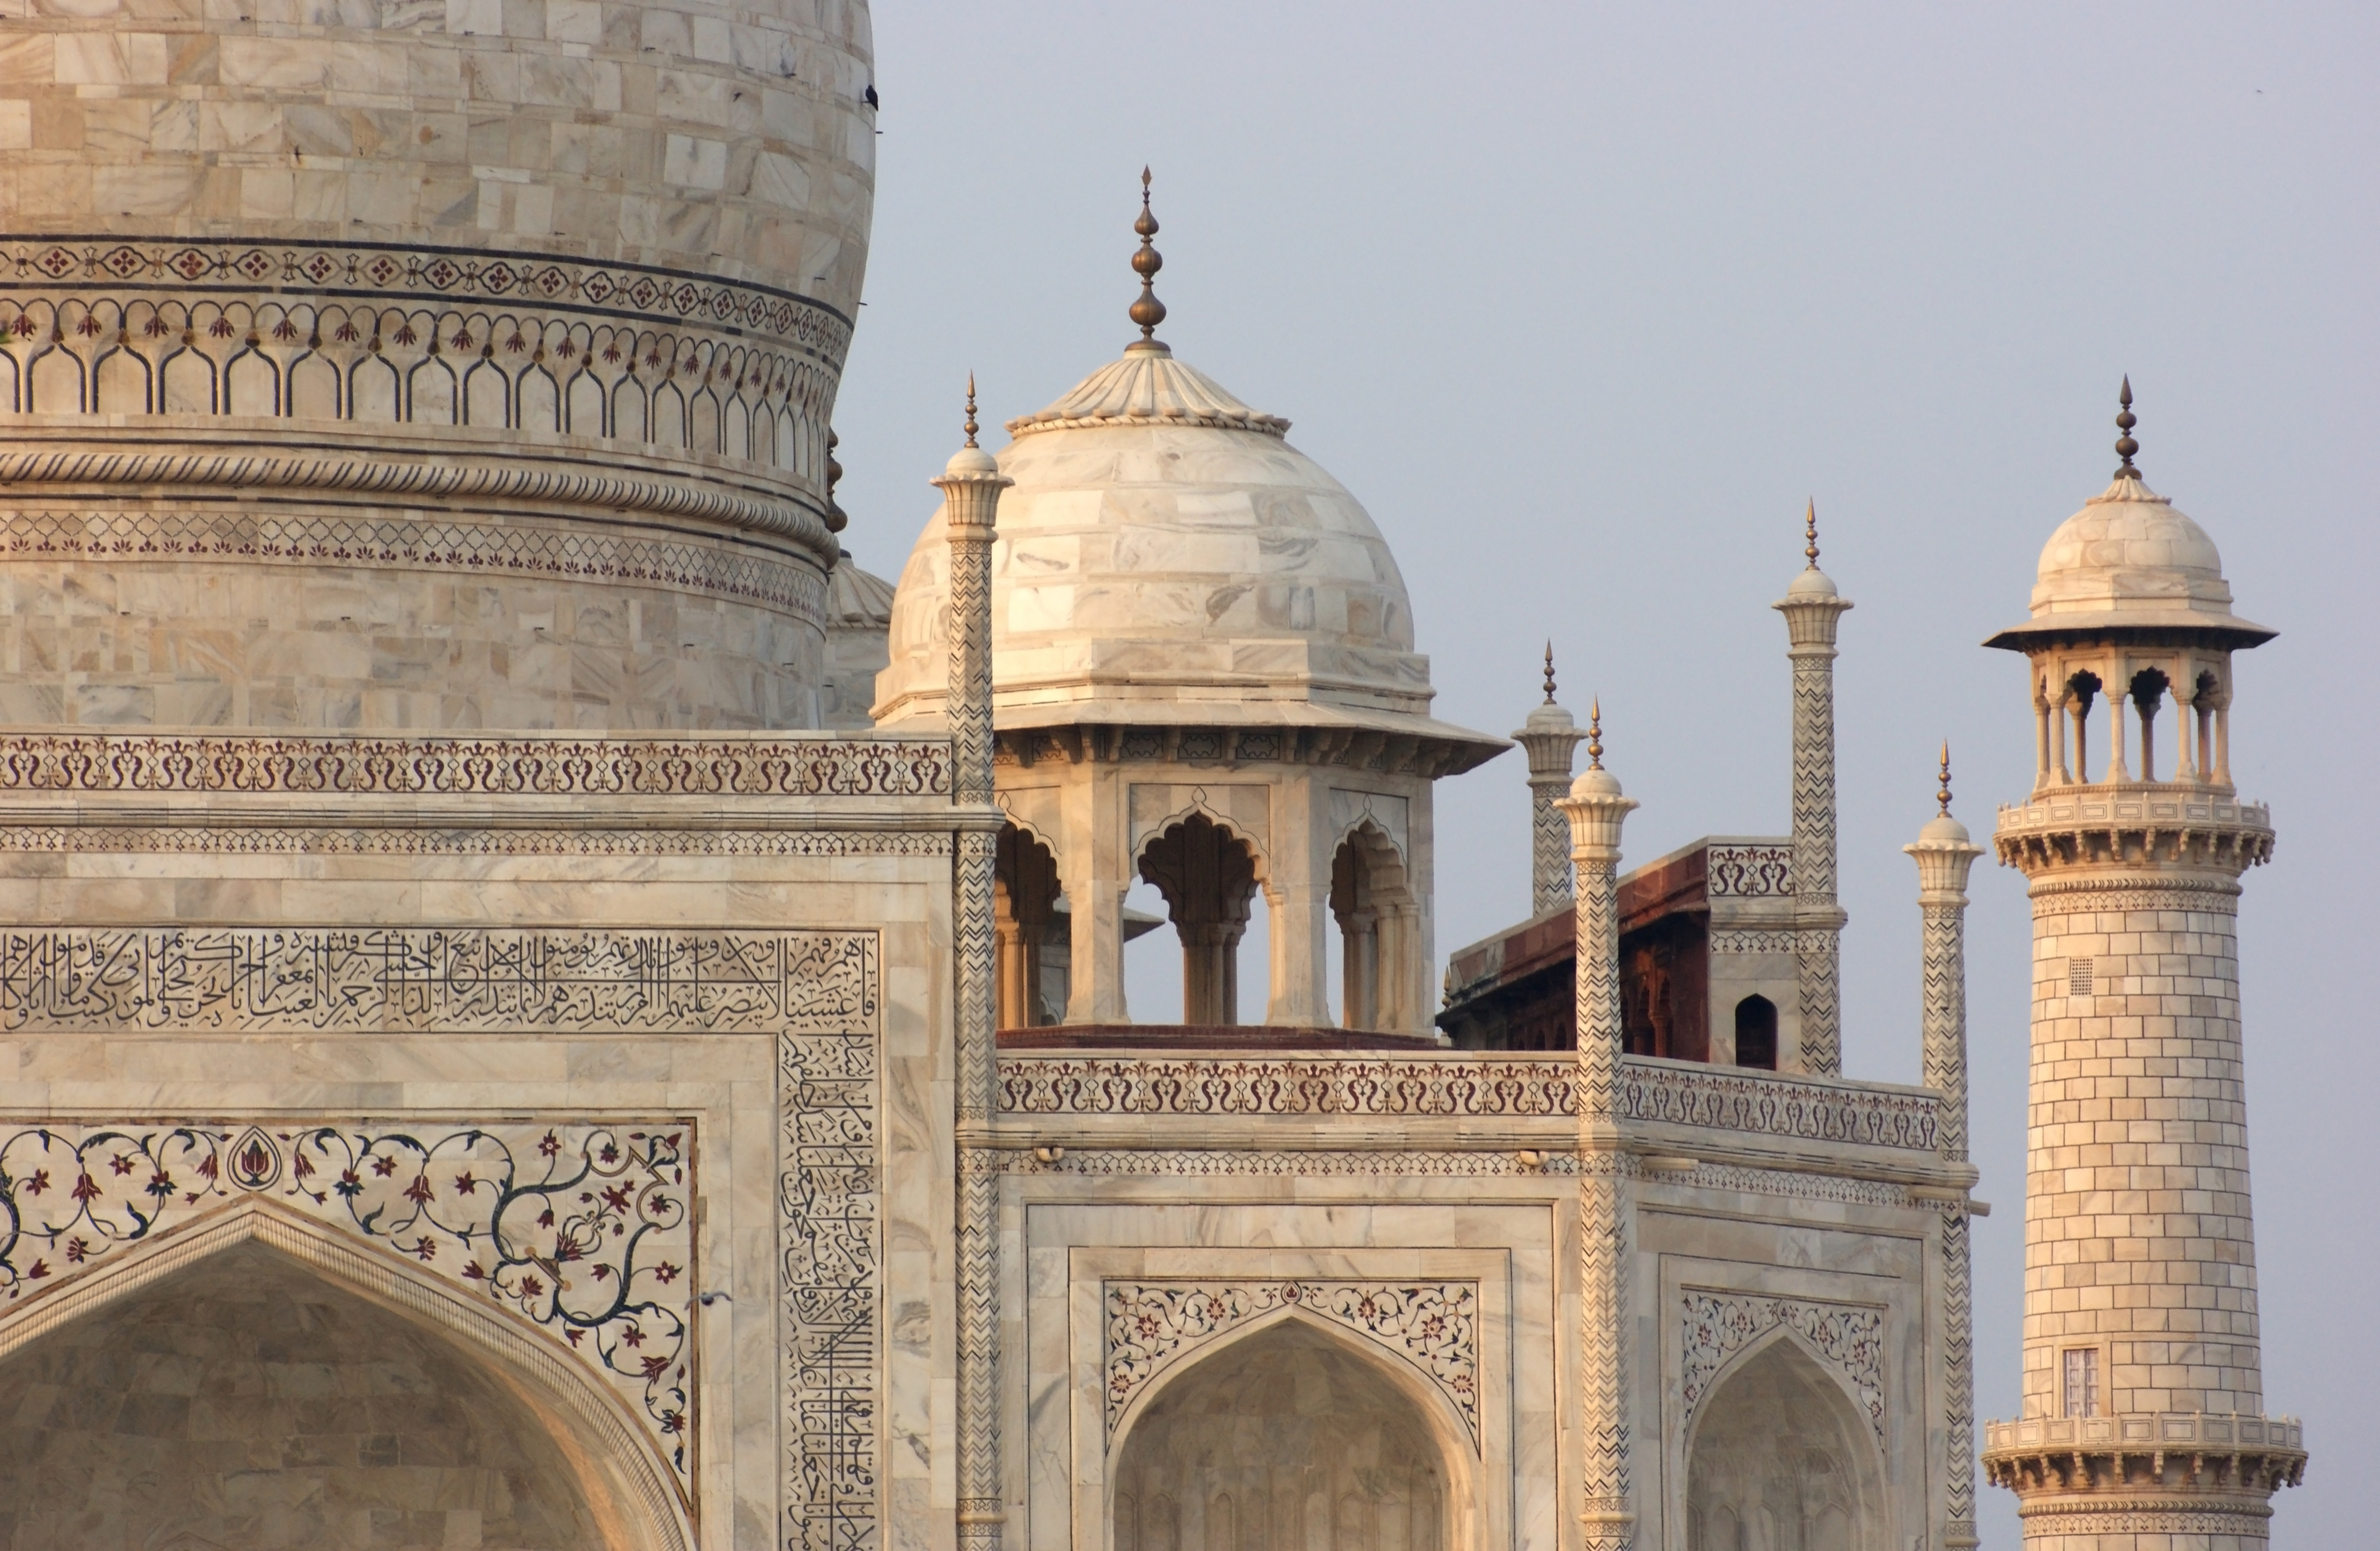 Todo un símbolo de la India: el Taj Mahal - India Gran Viaje Delhi, Jaipur, Agra